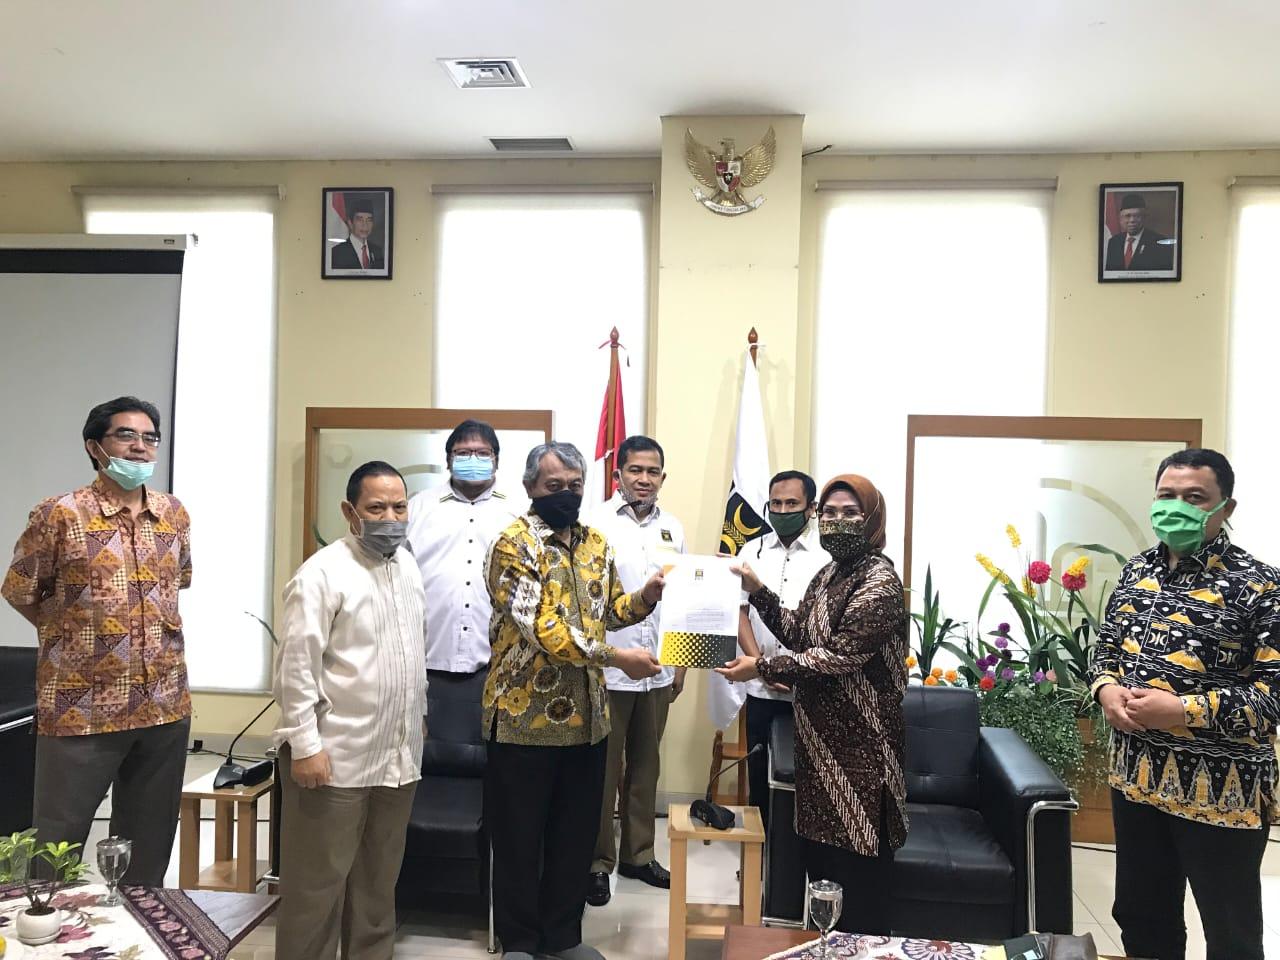 Ikut Barisan PDI Perjuangan dan Golkar, PKS Dukung Tatu-Pandji di Pilkada Kabupaten Serang